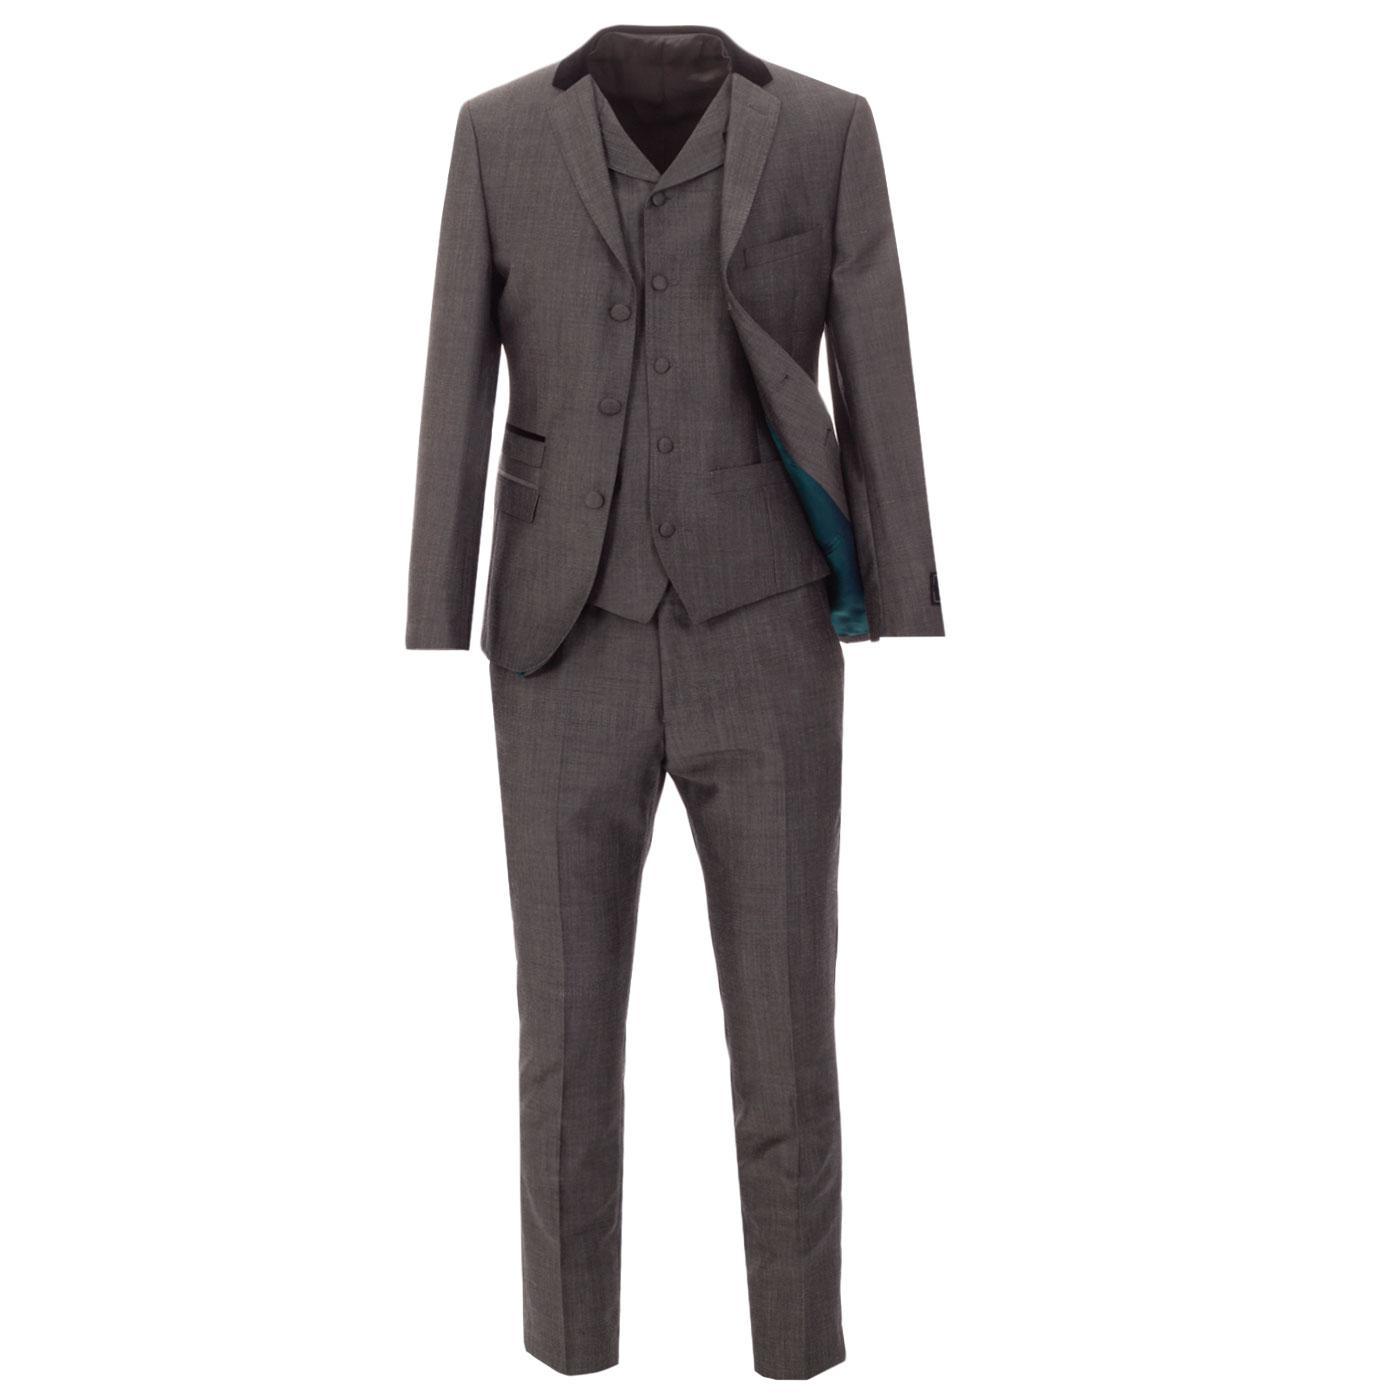 MADCAP ENGLAND 60s Mod 2/3 Piece Suit in Silver